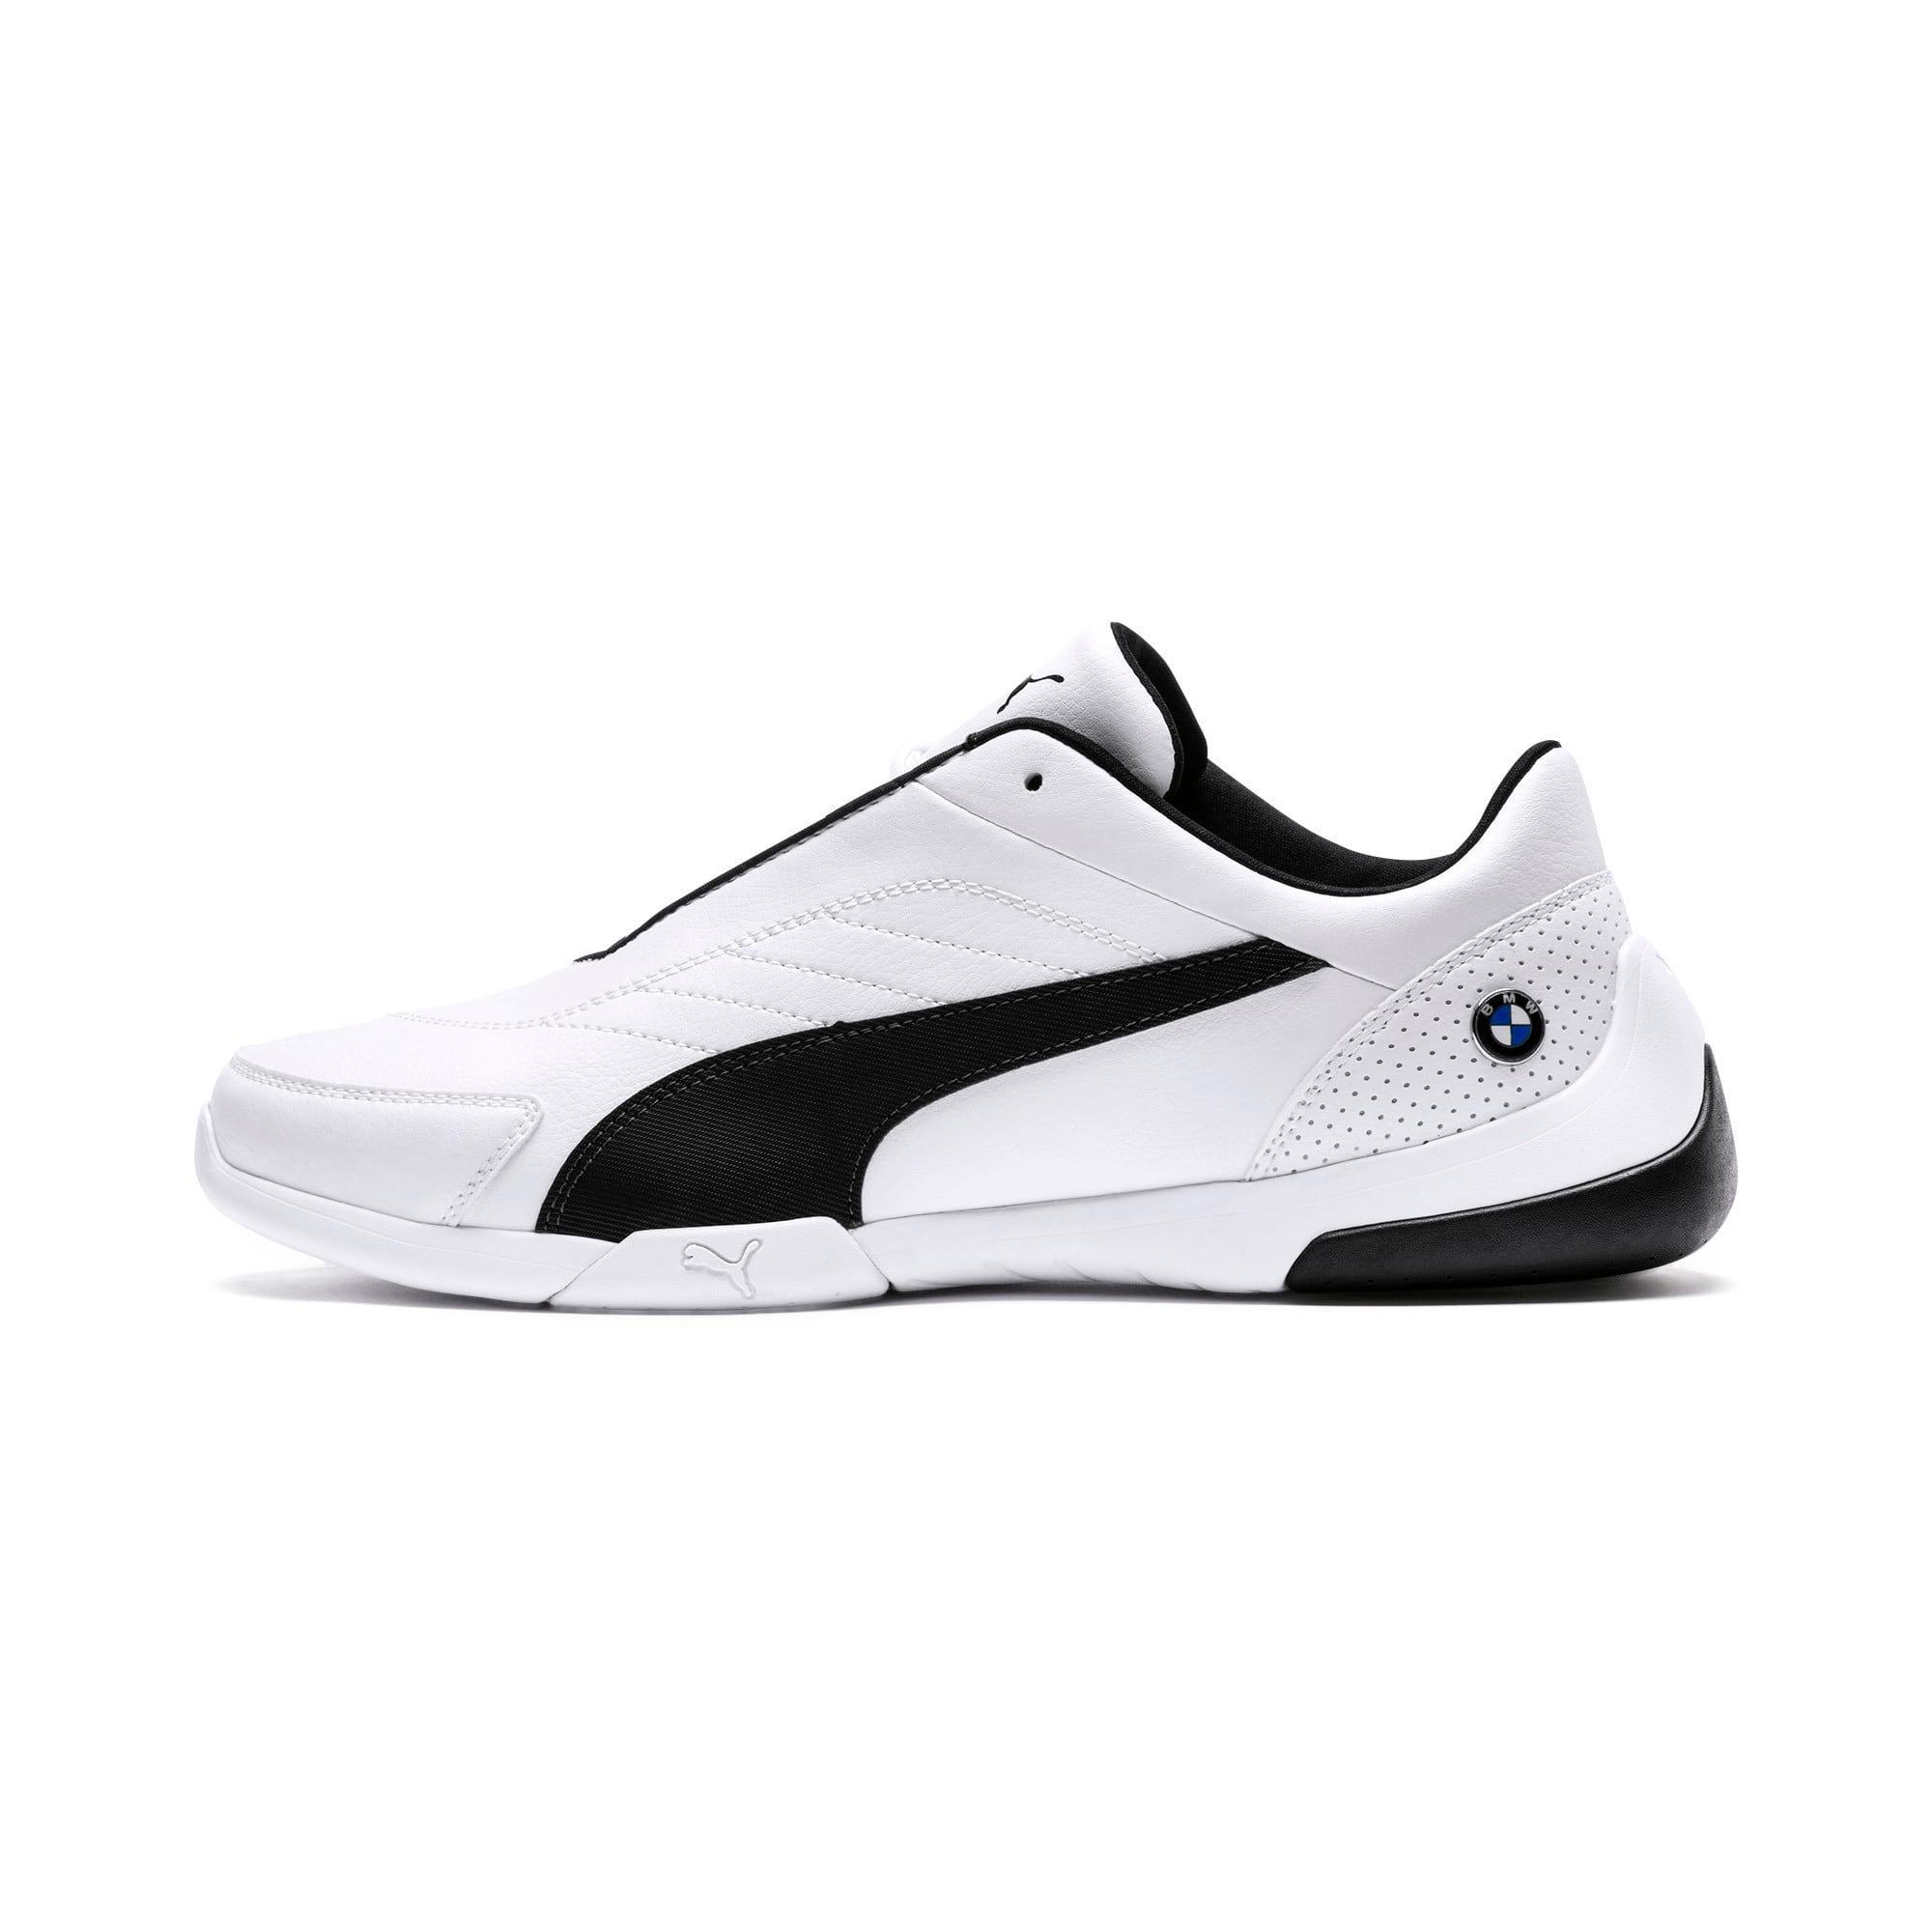 Thumbnail 1 of BMW M Motorsport Kart Cat III Shoes, Puma White-Anthracite, medium